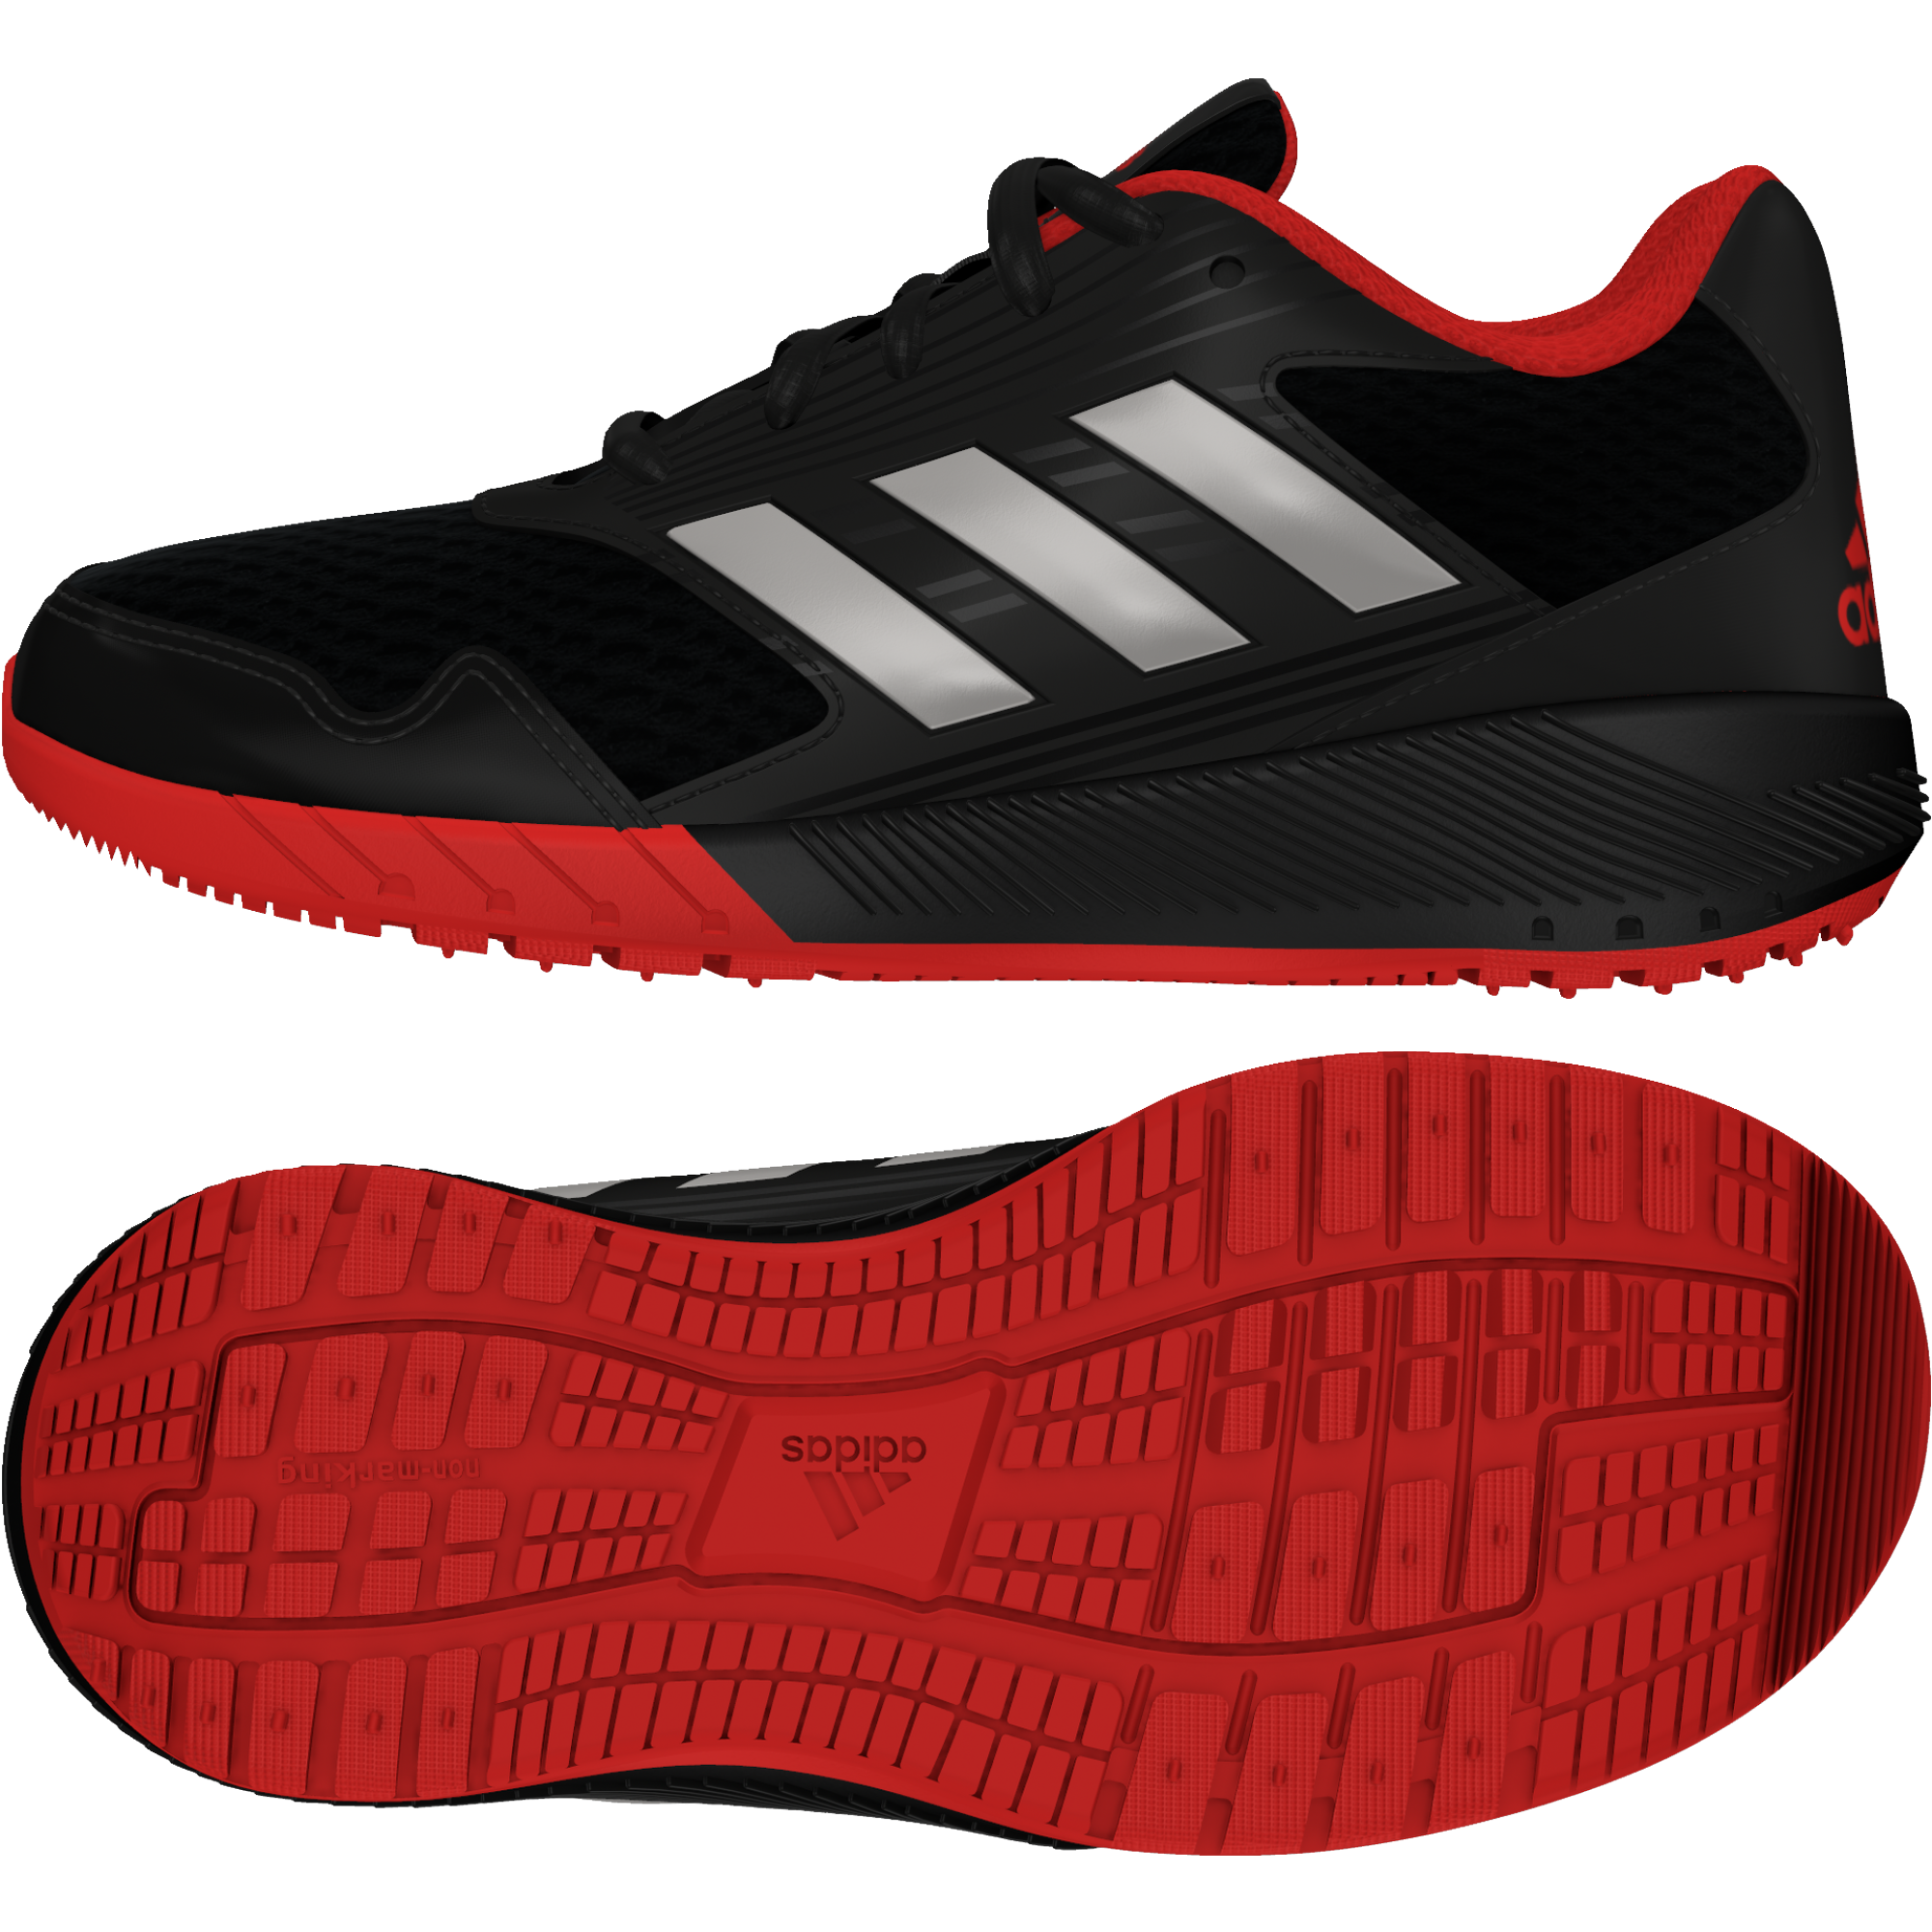 97dc67b4a3 Adidas Altarun K kamaszfiú futócipő , Fiú Gyerek cipő | futócipő |  adidas_performance | Adidas Altarun K kamaszfiú futócipő